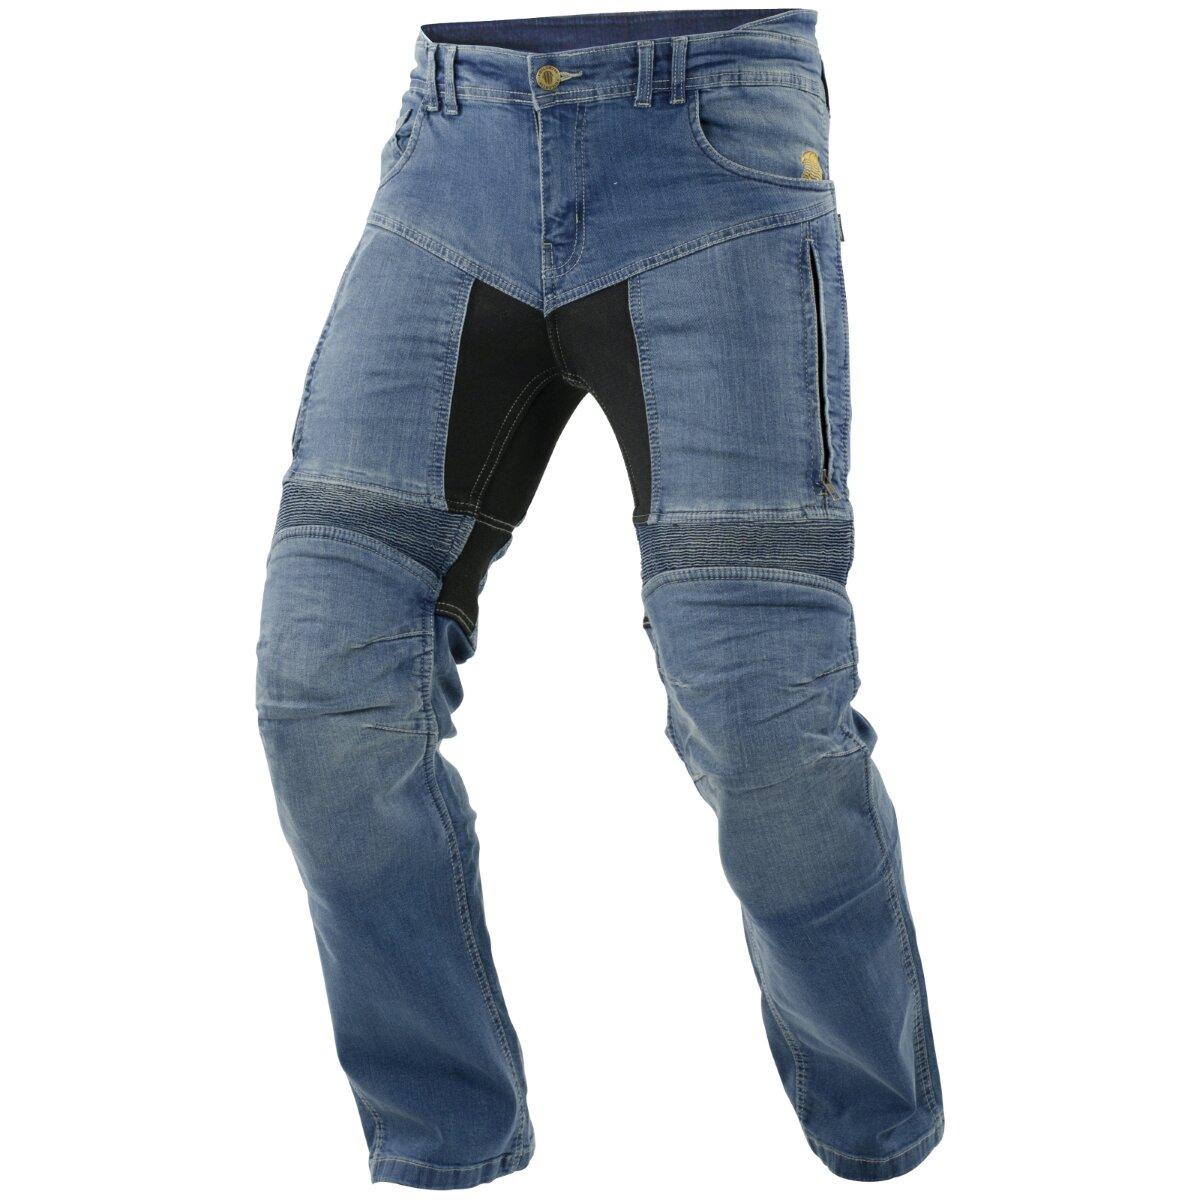 trilobite parado motorrad jeans herren blau wild wear 189 00. Black Bedroom Furniture Sets. Home Design Ideas